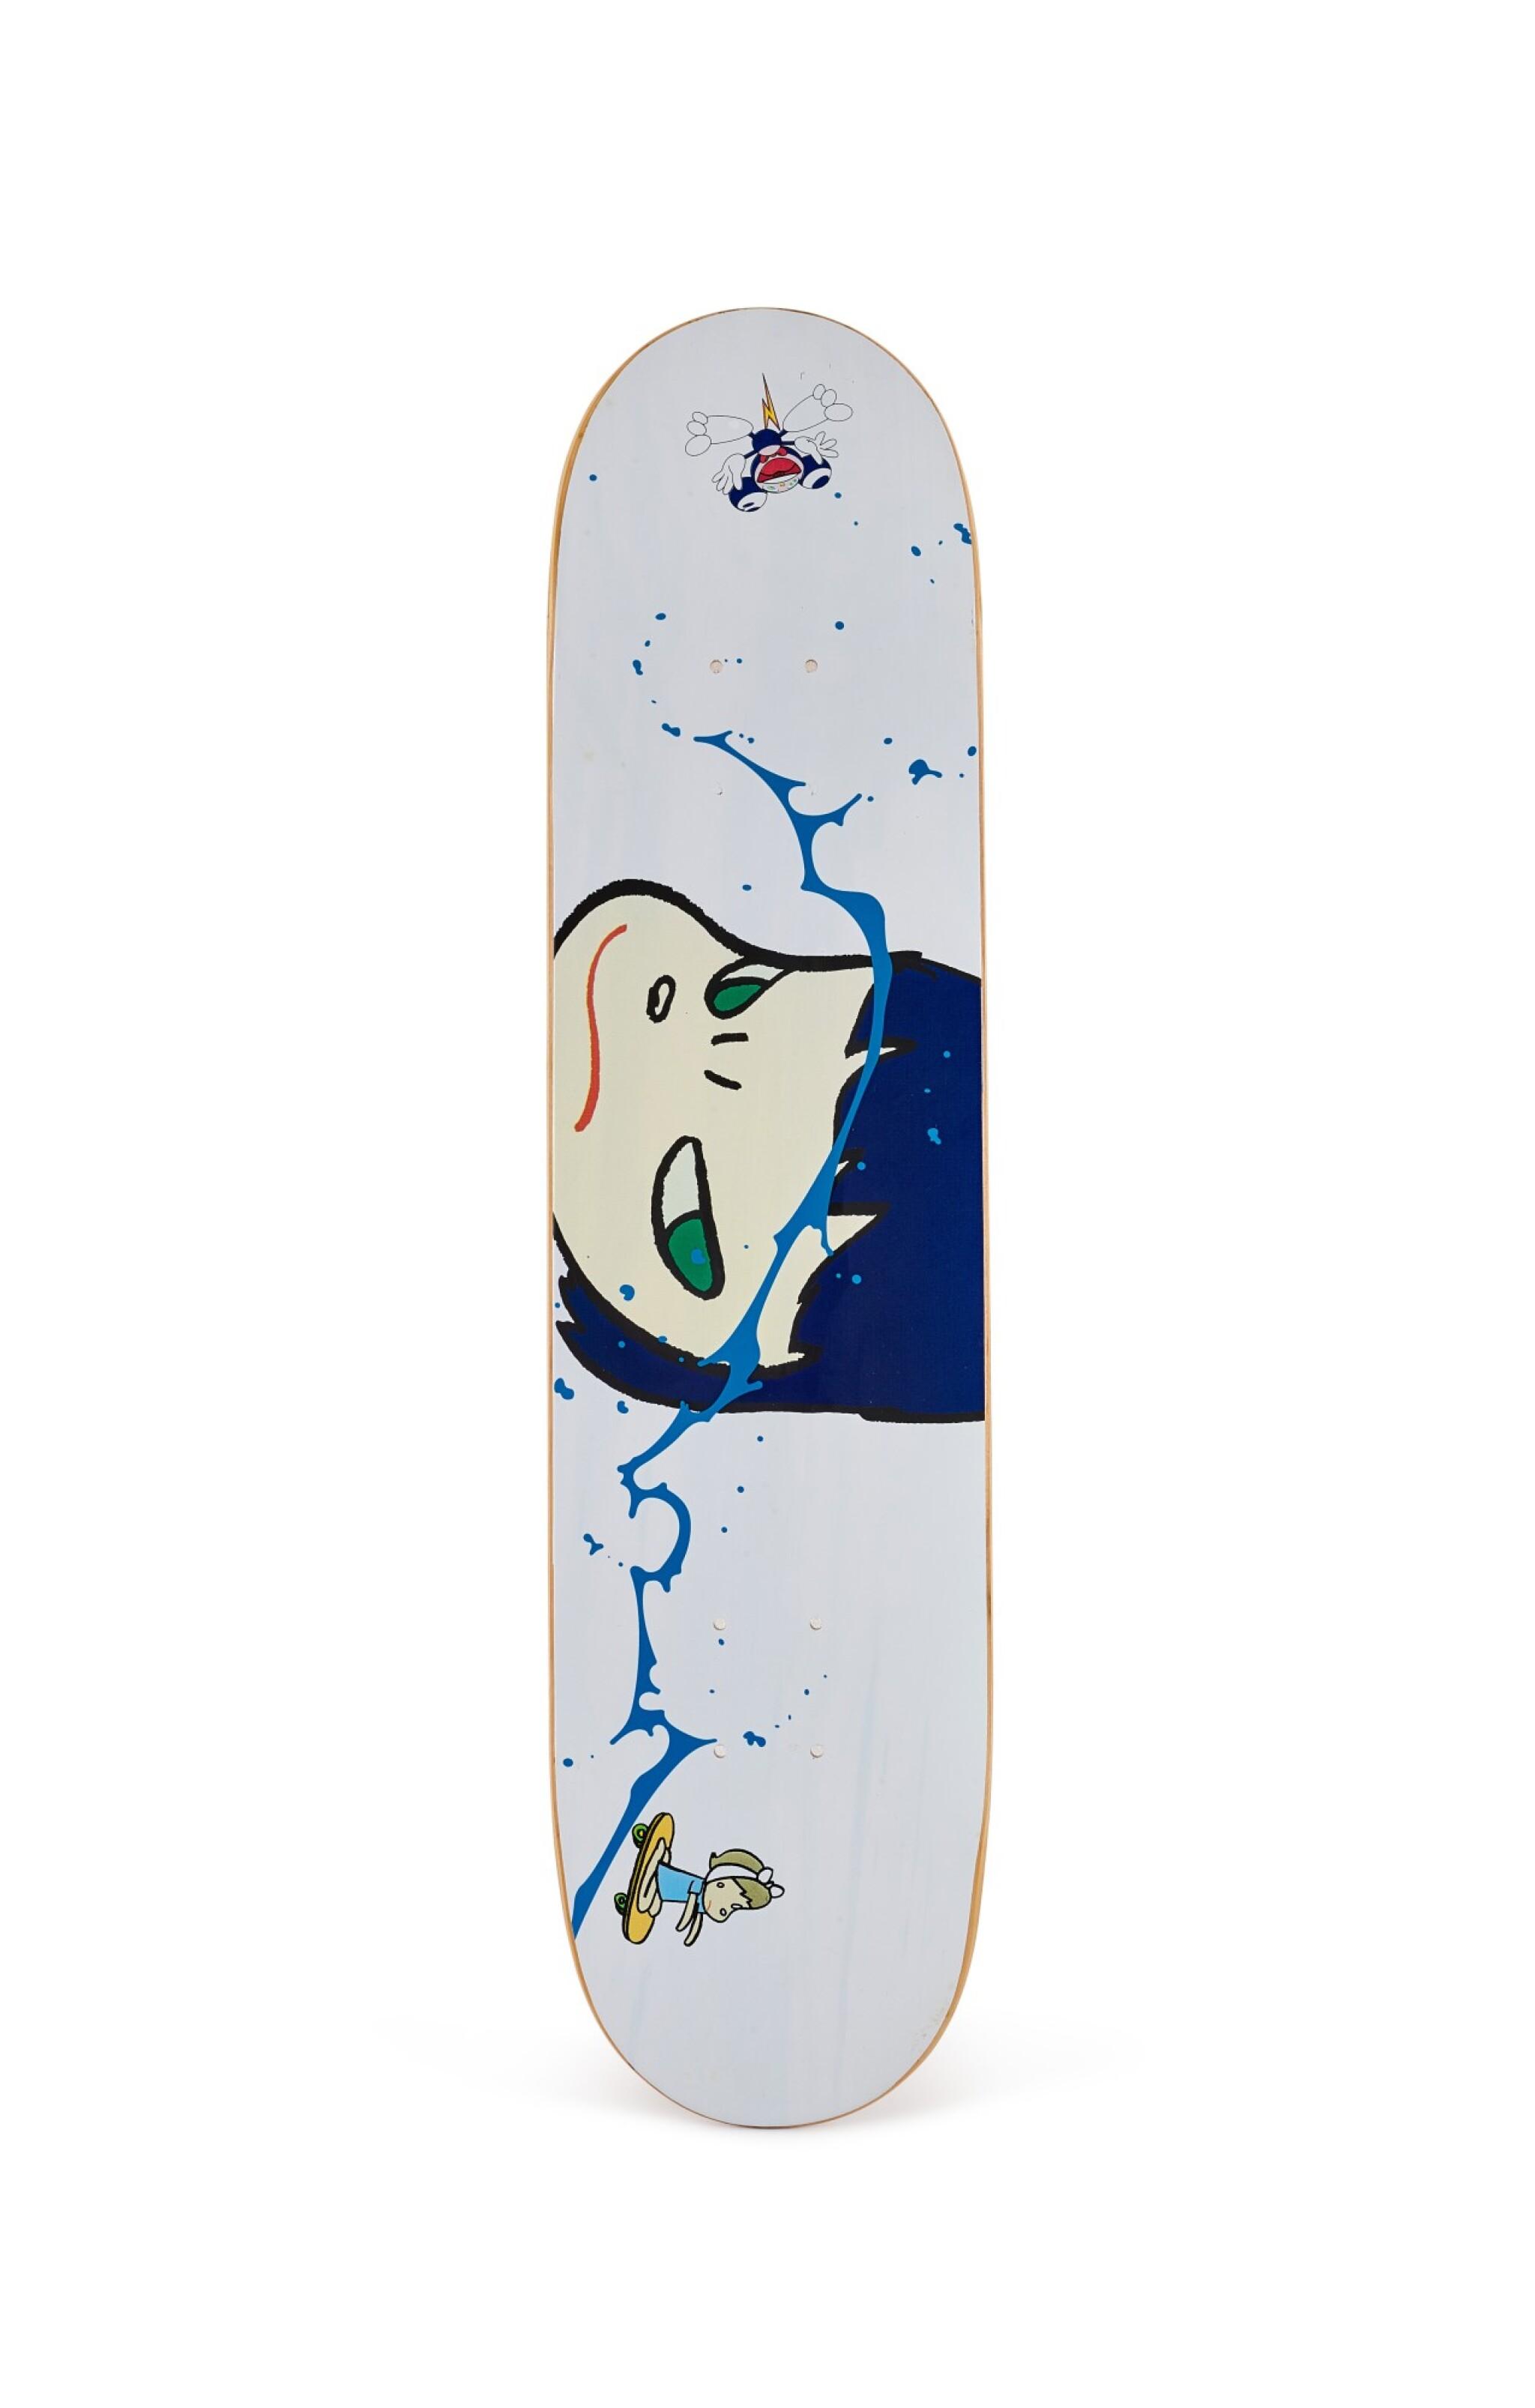 View 1 of Lot 9018. 奈良美智 x 村上隆 YOSHITOMO NARA X TAKASHI MURAKAMI   滑板 Skate Deck .